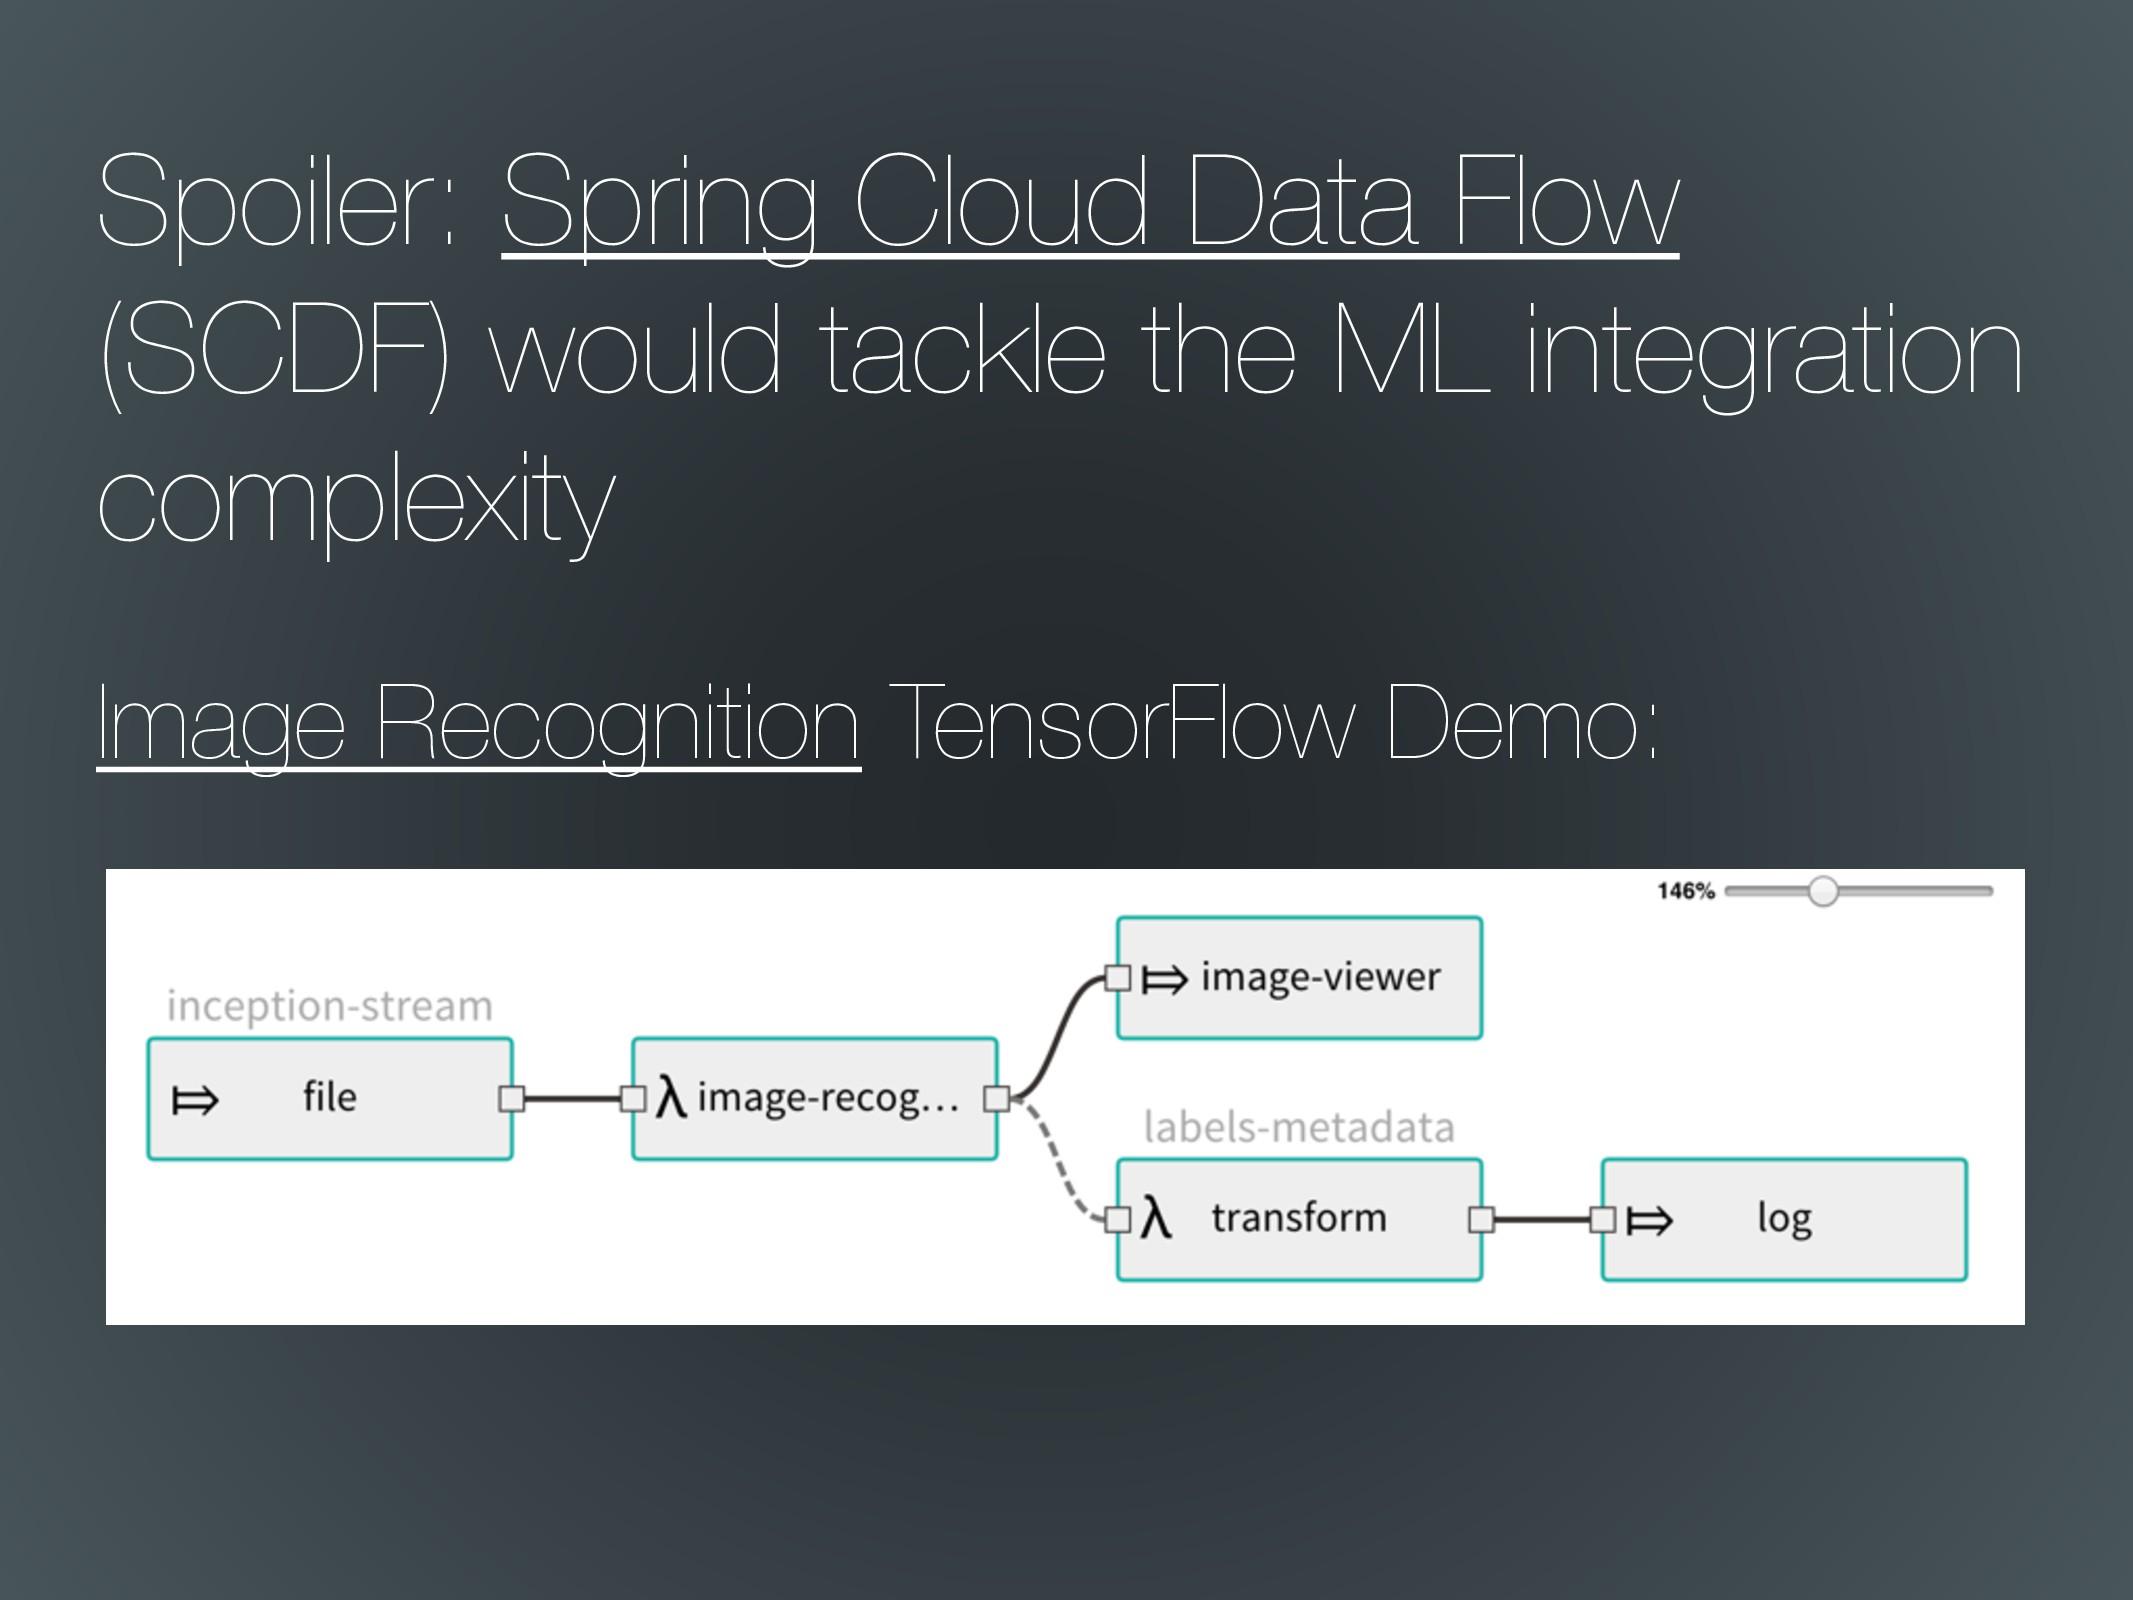 Spoiler: Spring Cloud Data Flow (SCDF) would ta...